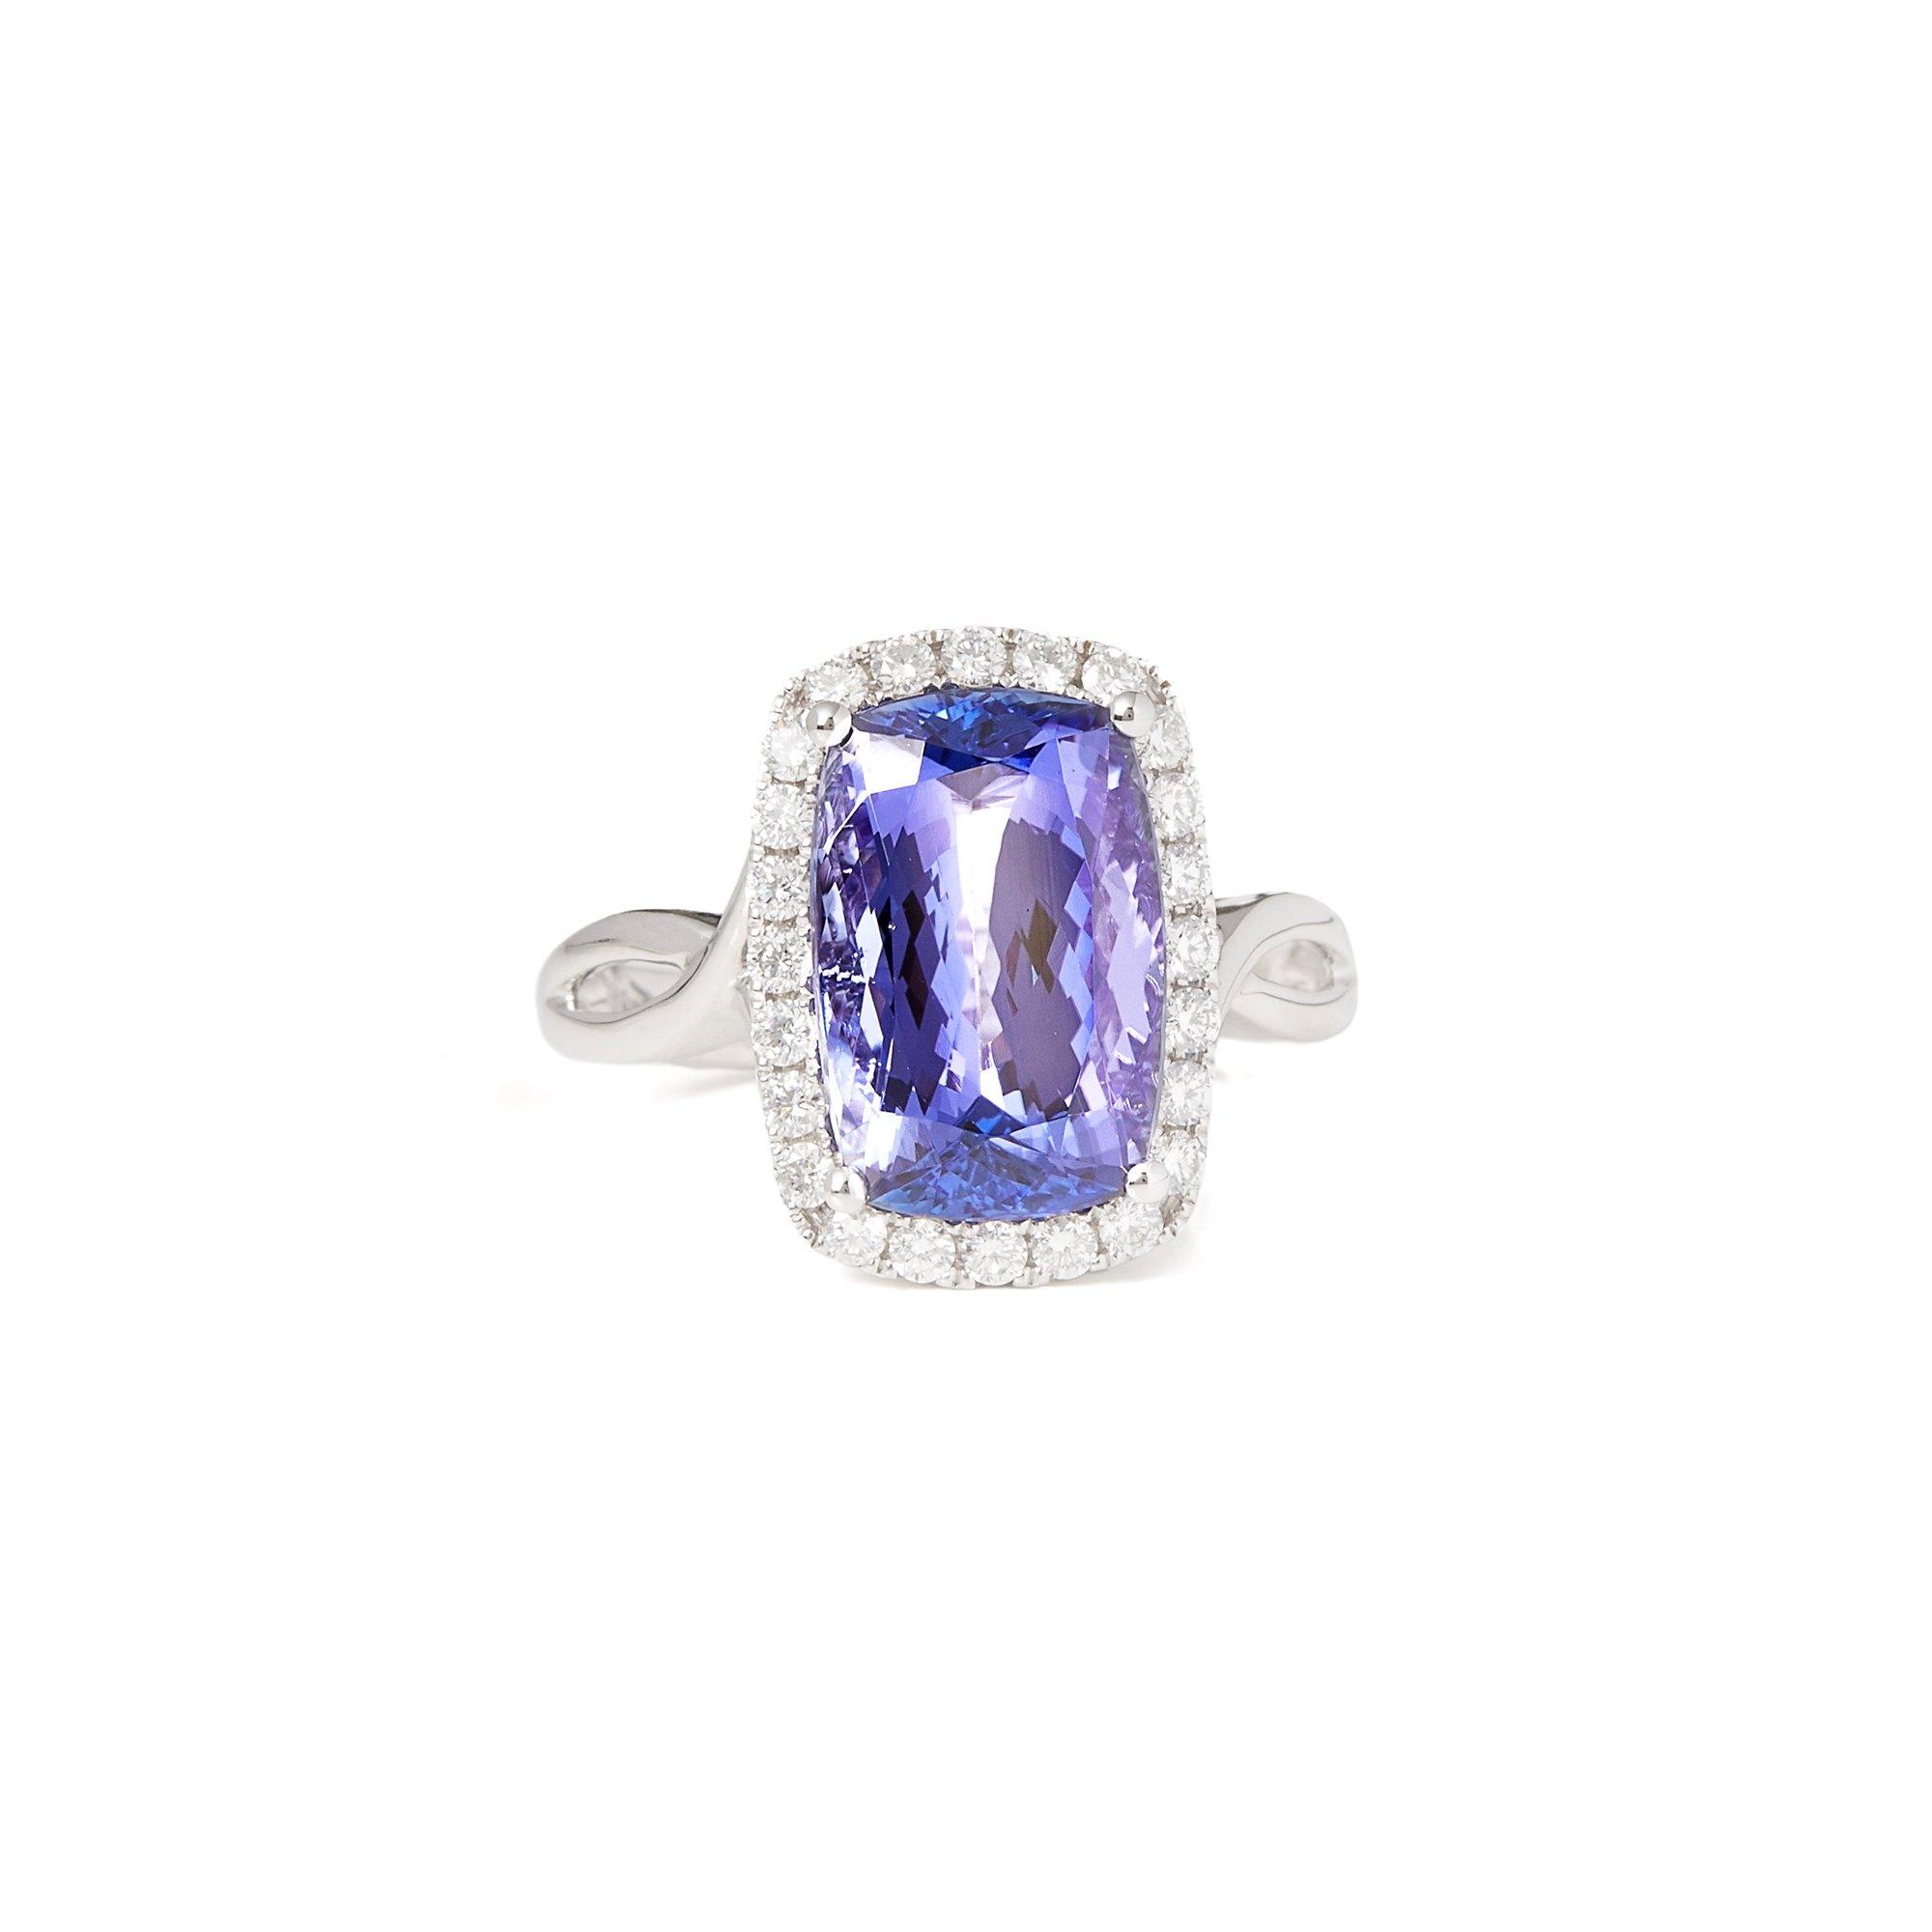 David Jerome Certified 5.60ct Cushion Cut Tanzanite and Diamond Ring